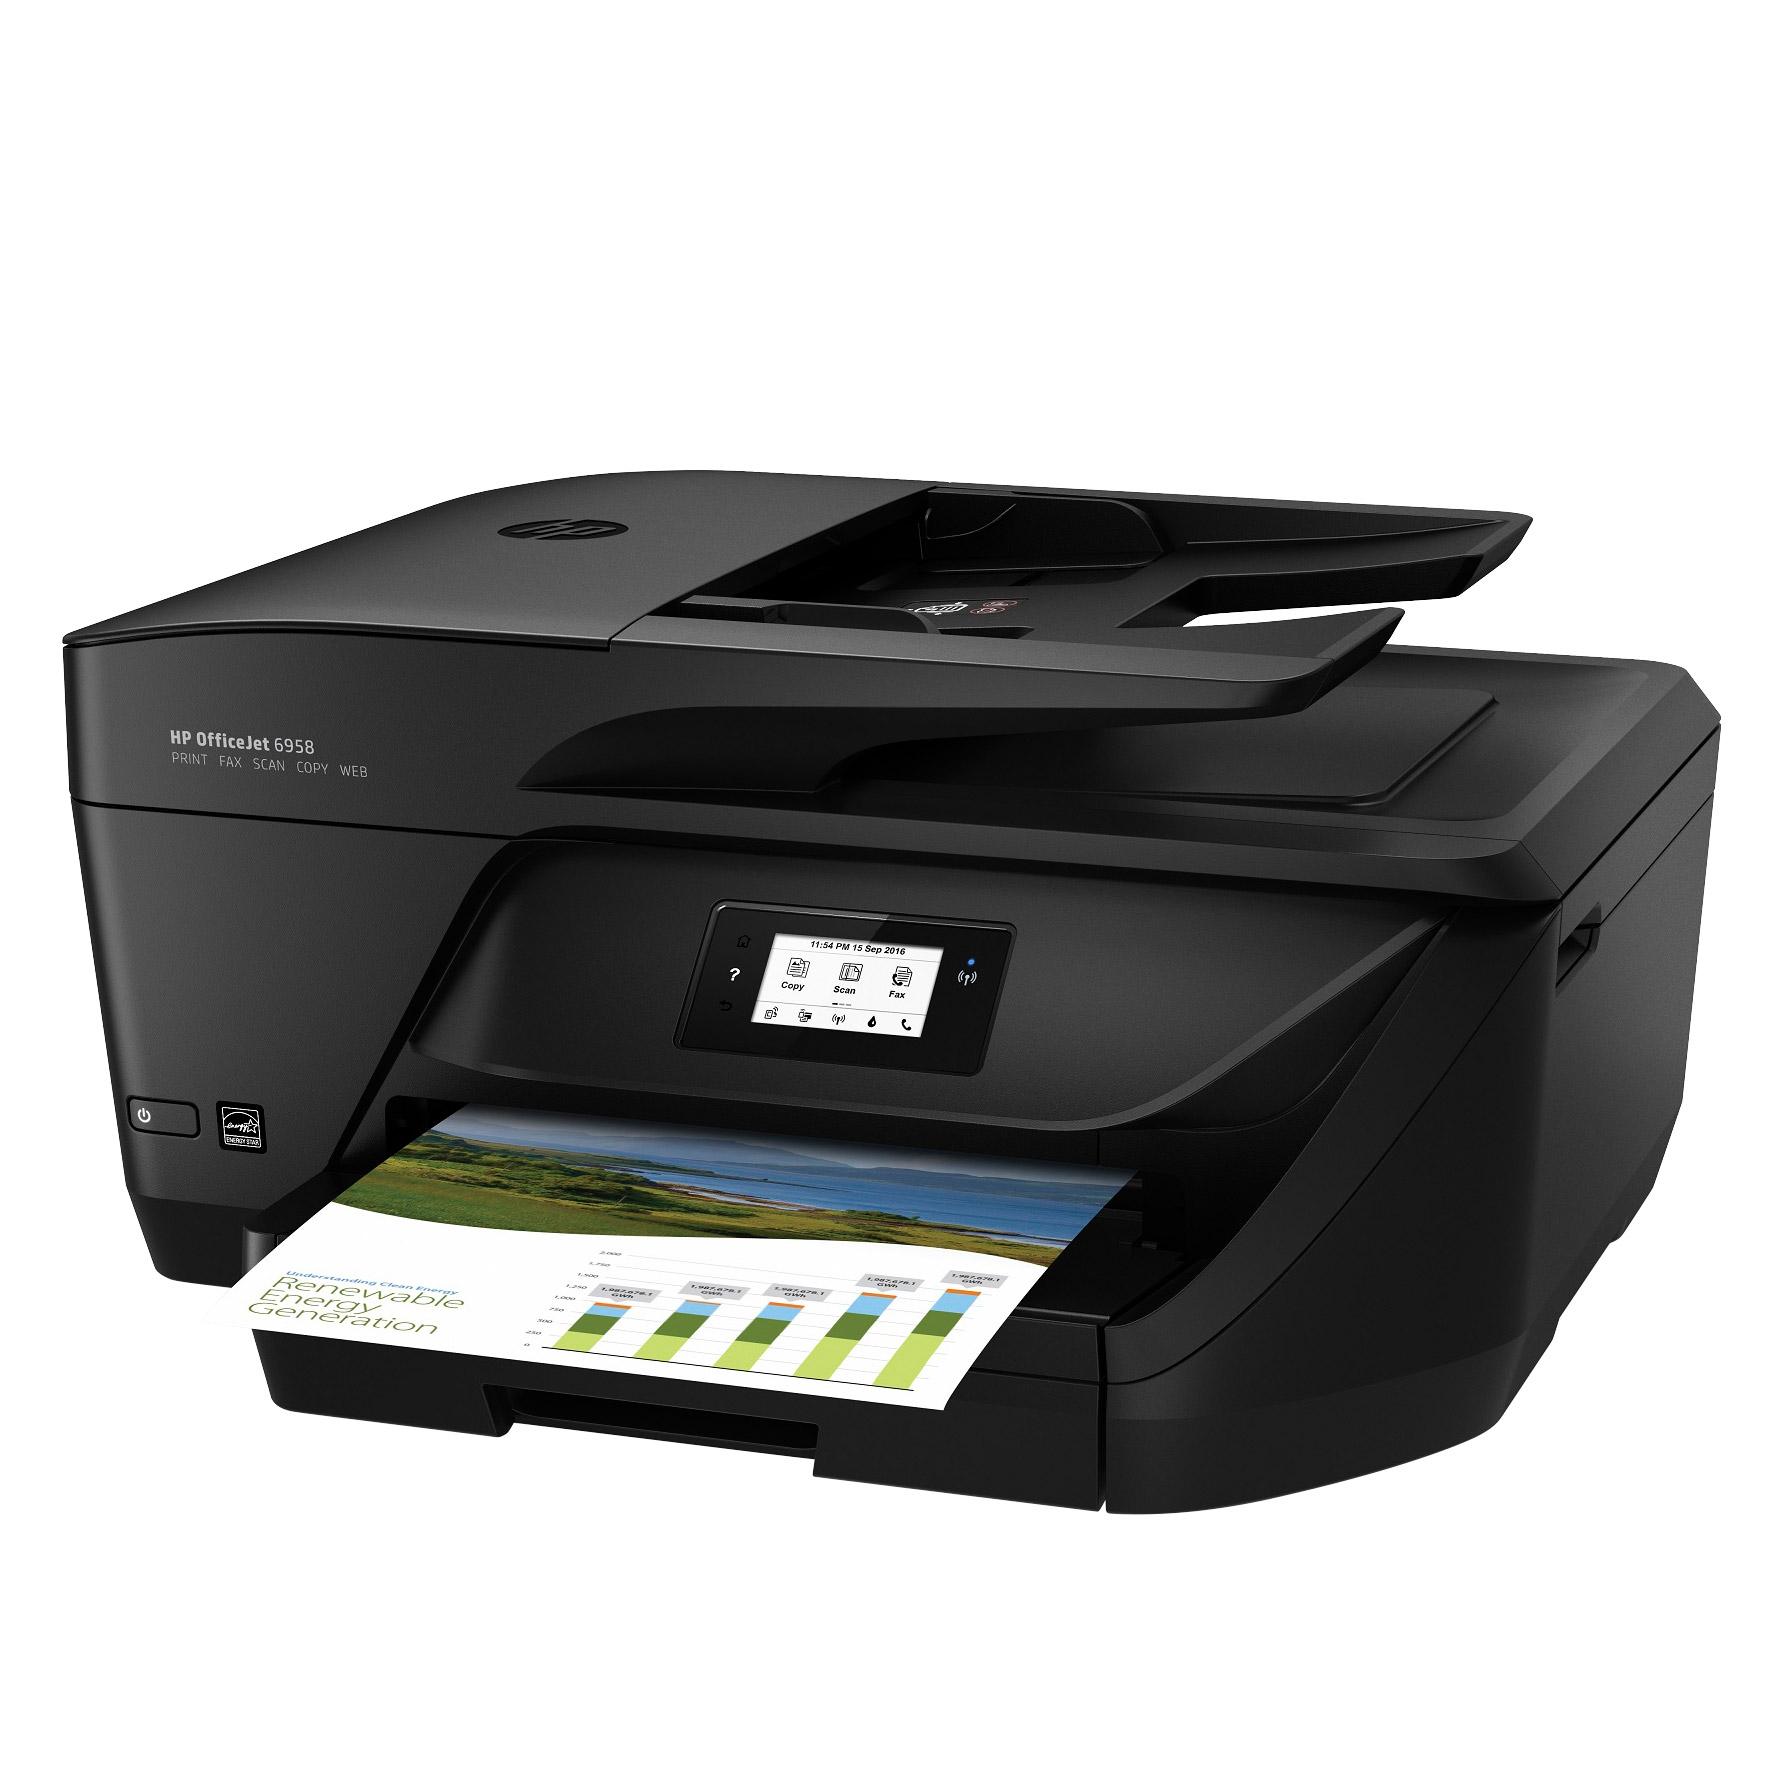 HP Officejet Pro 6958 All In One Color Inkjet Printer